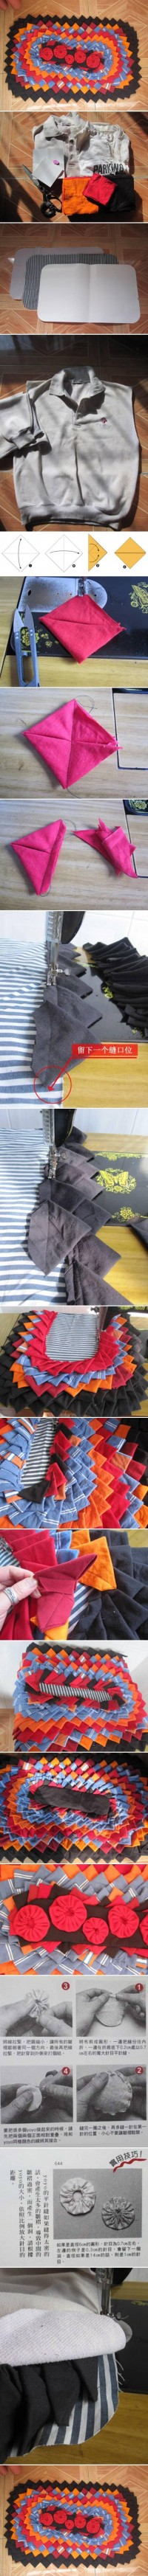 DIY Old Clothes Carpet Mat DIY Projects | UsefulDIY.com